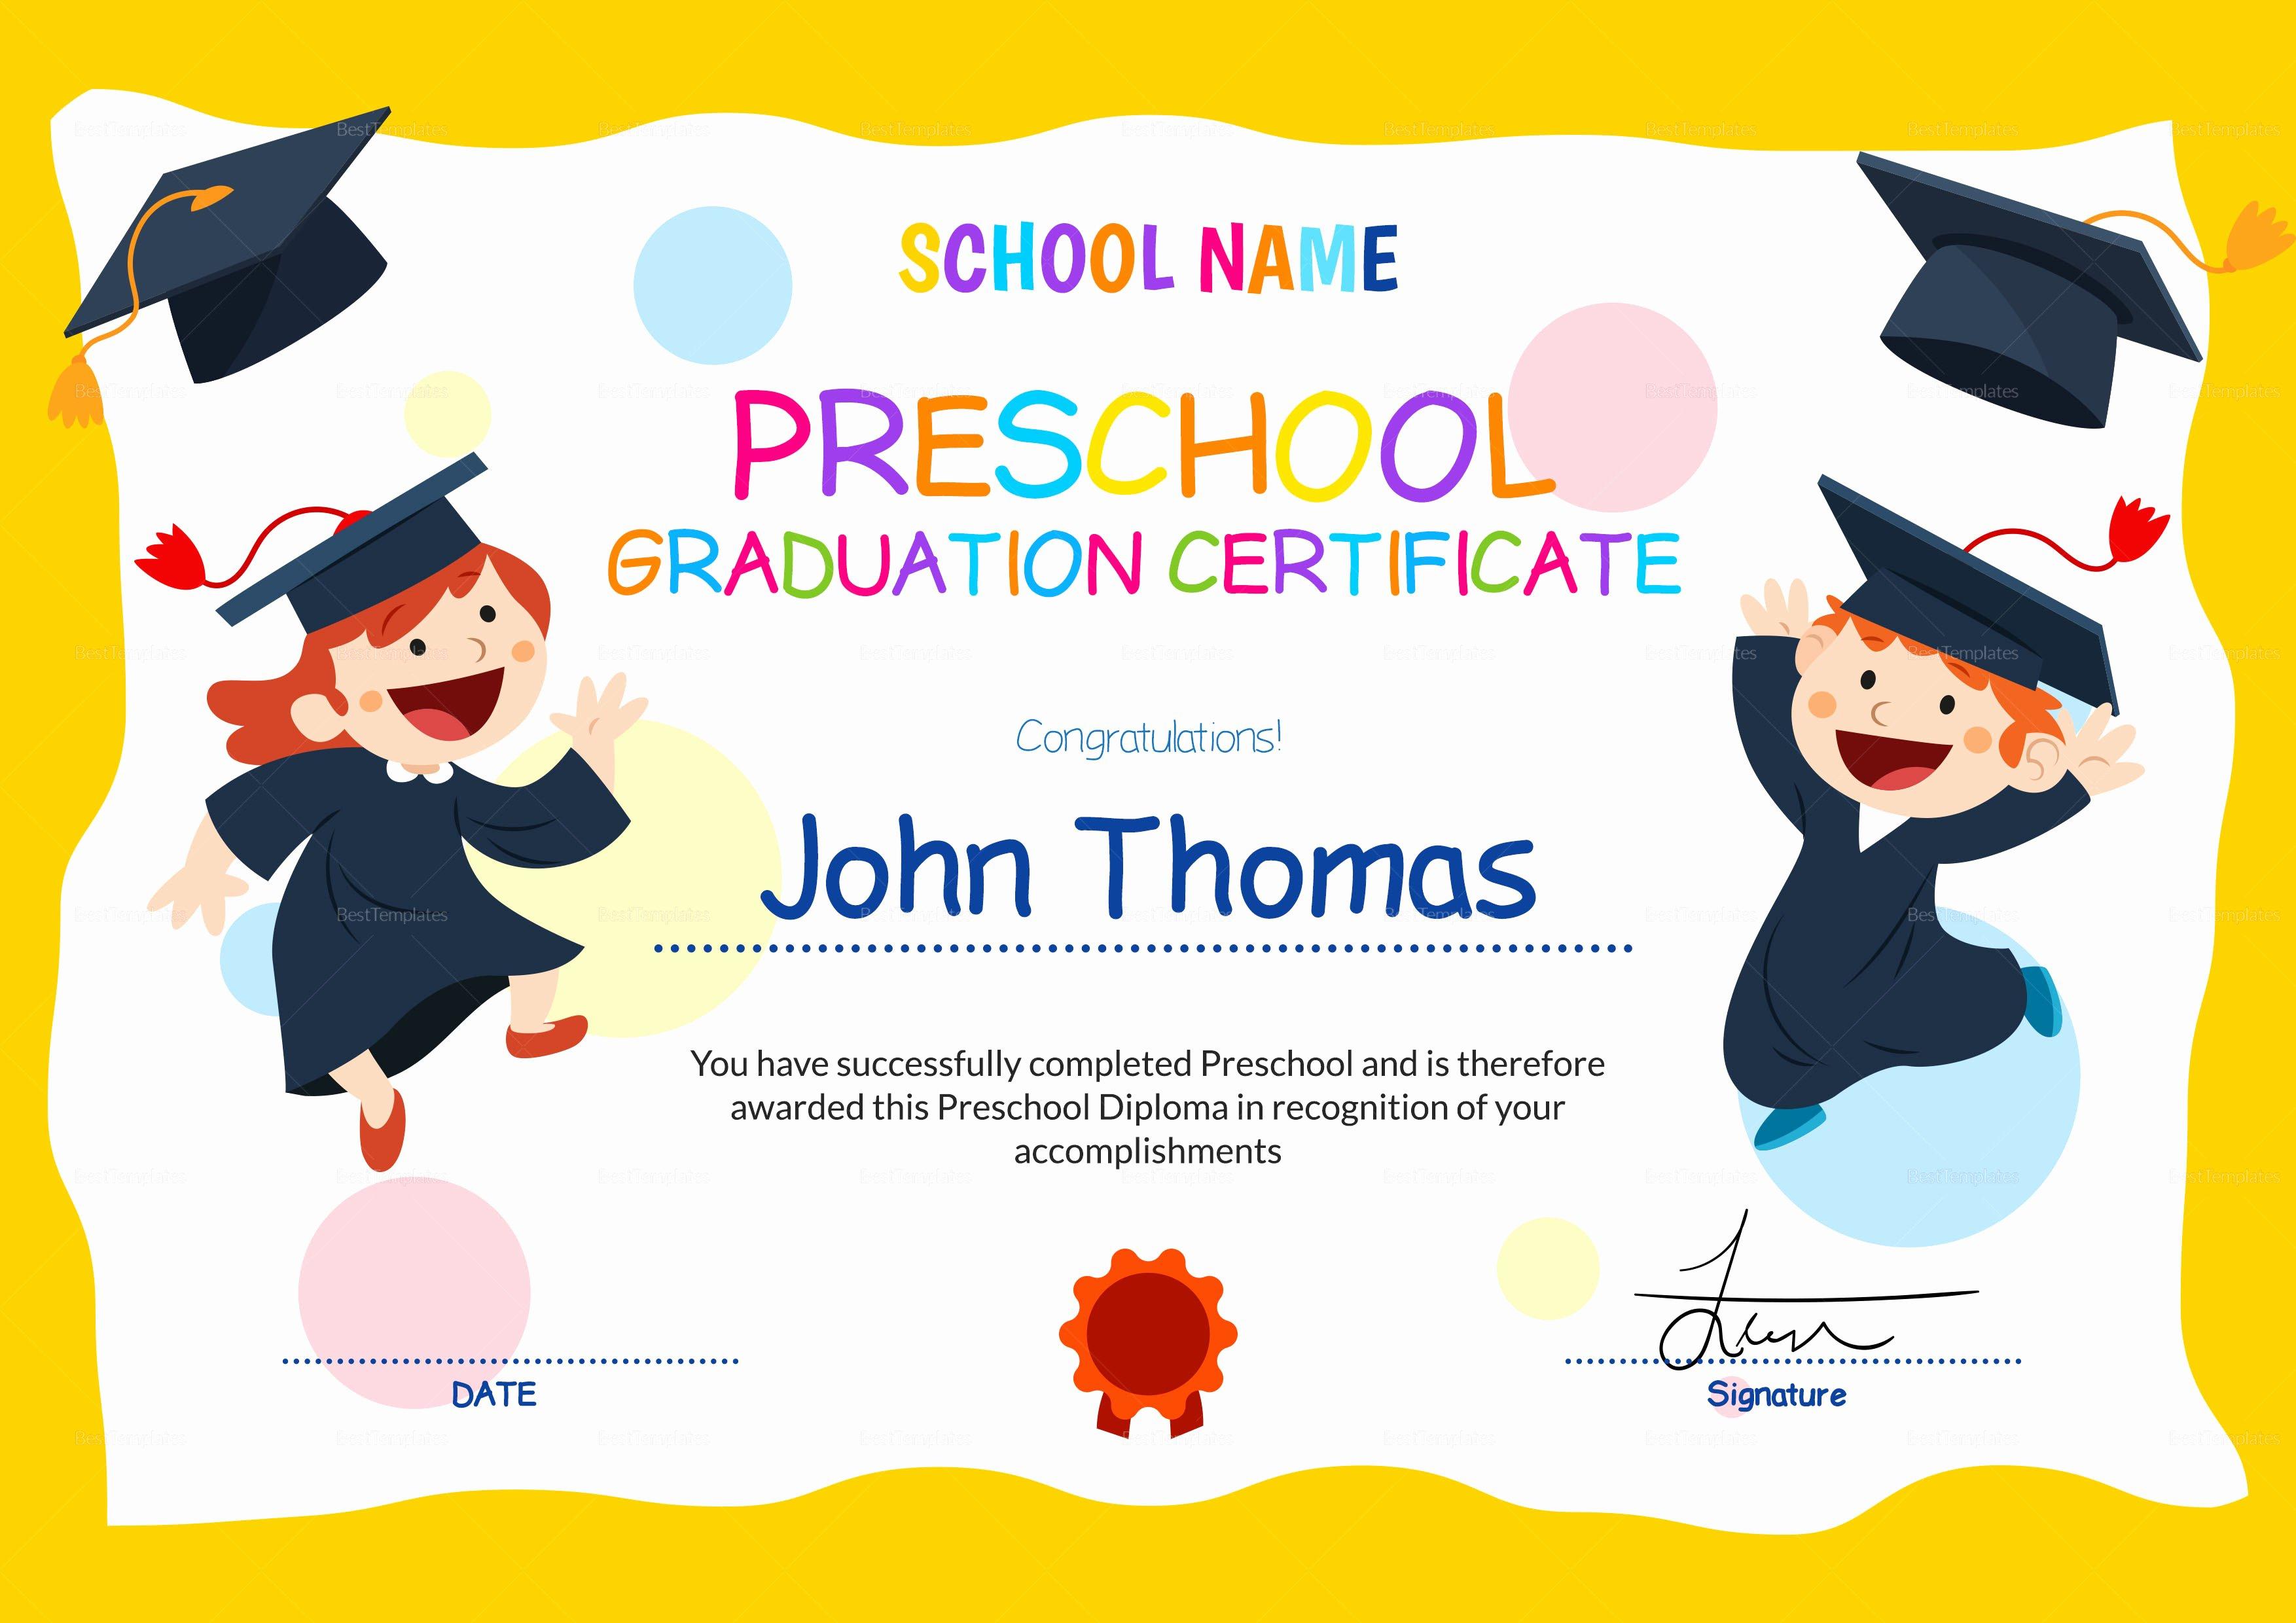 Preschool Graduation Certificate Design Template In Psd Word